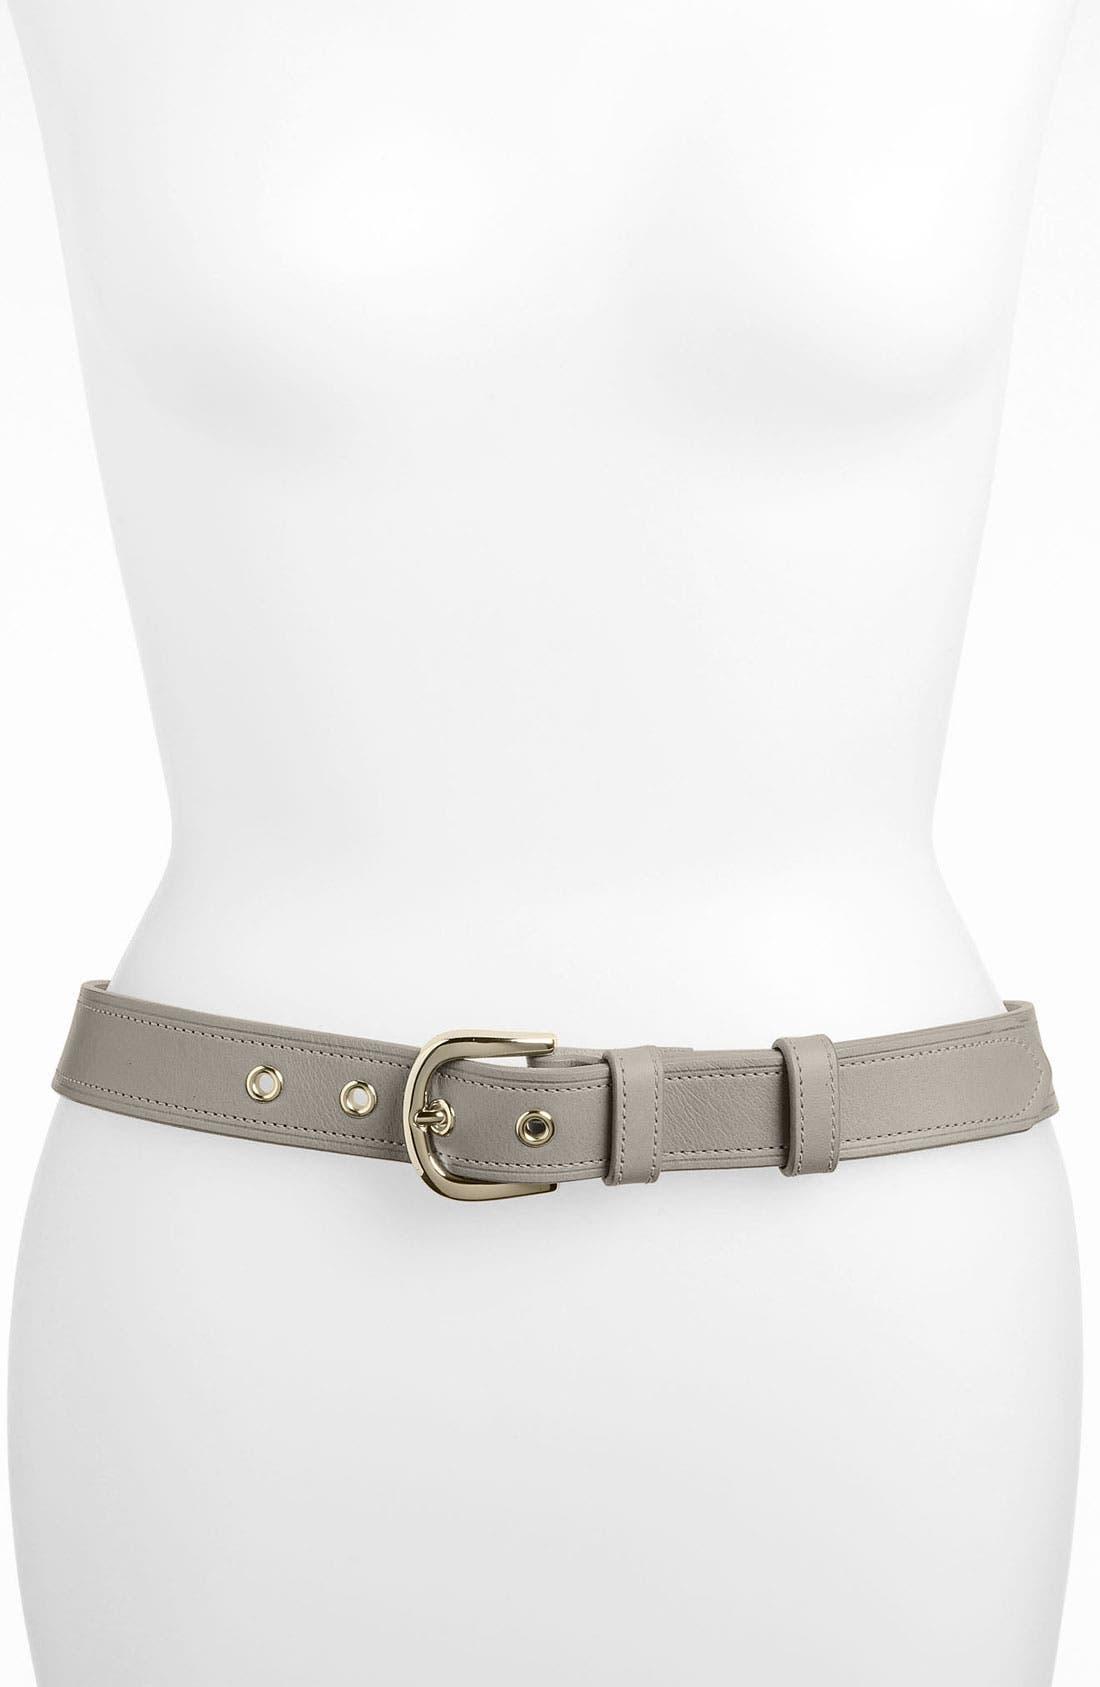 Alternate Image 1 Selected - Halogen® 'Classic Grommet' Leather Belt